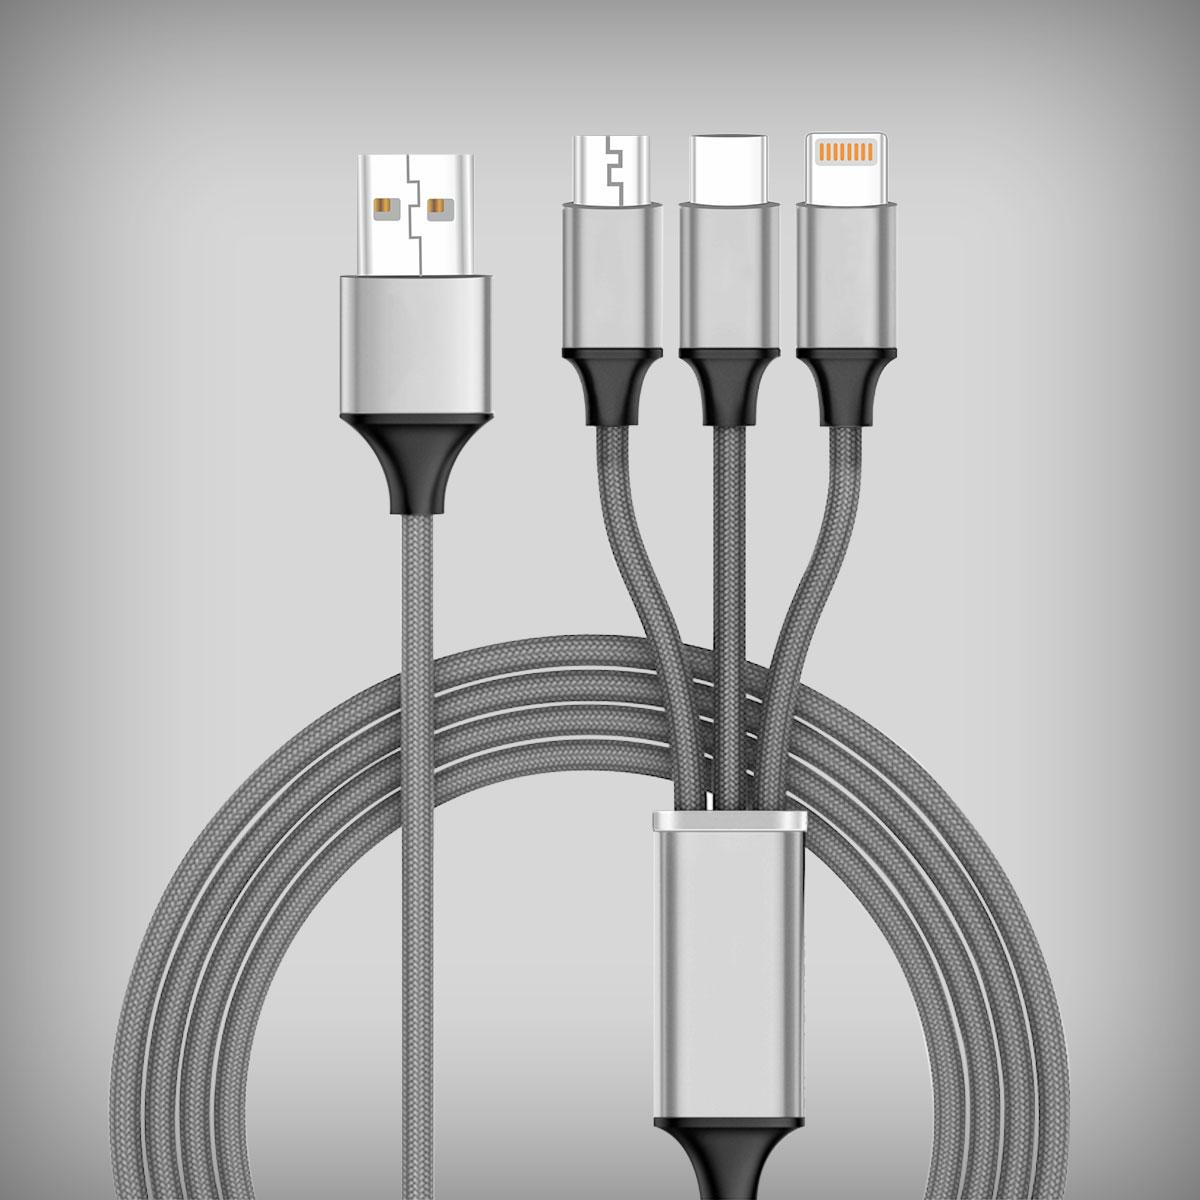 4FT-3N1-NL-TYP-C-USB-GY